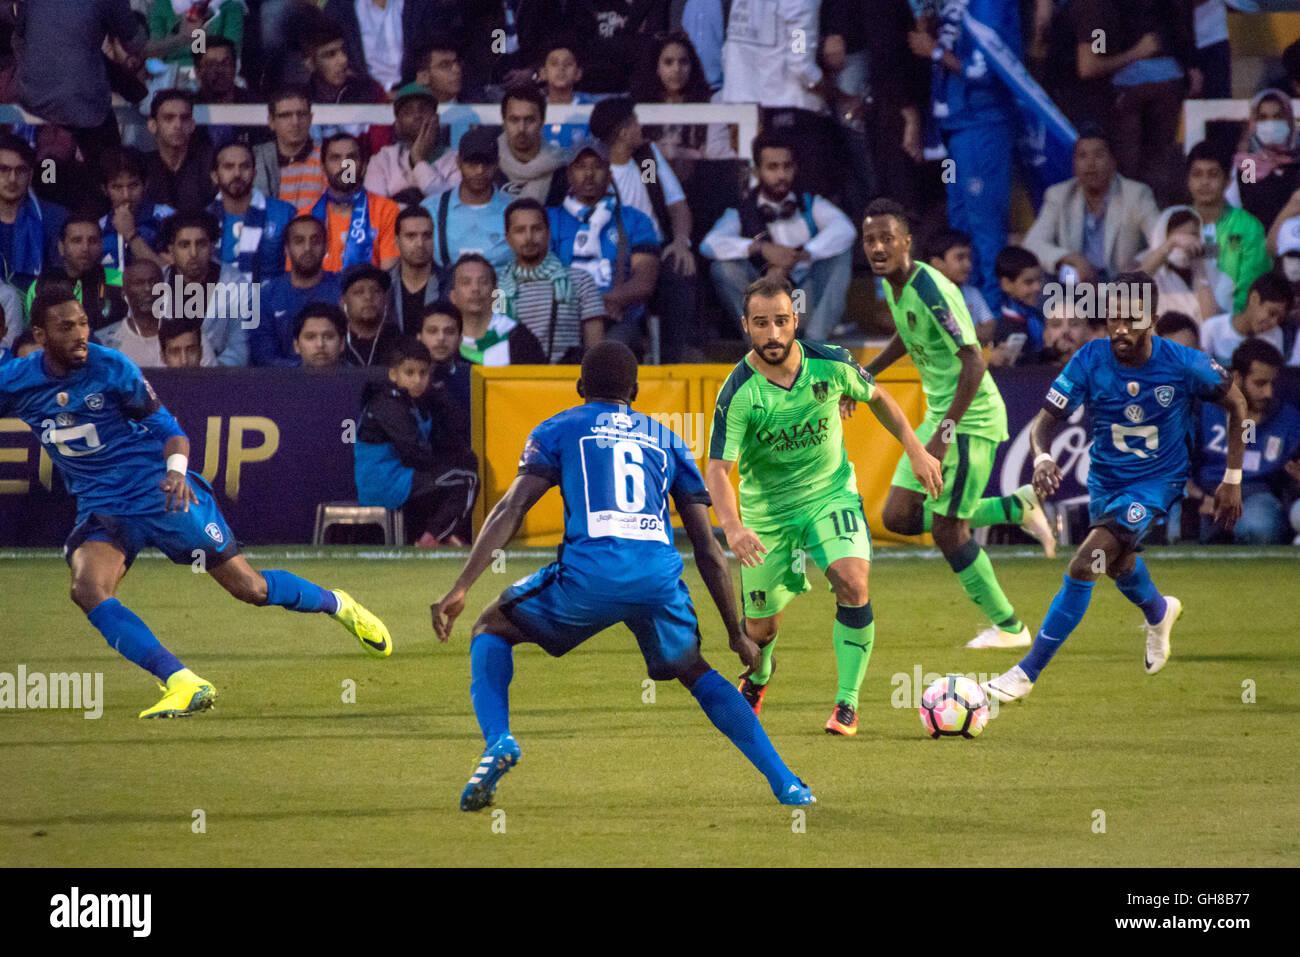 London, UK. 8th August, 2016. Giannis Fetfatzidis #10, Abdulmalek Al-Khaibri #6. Al- Ahli vs Al-Hilal Saudi Super - Stock Image